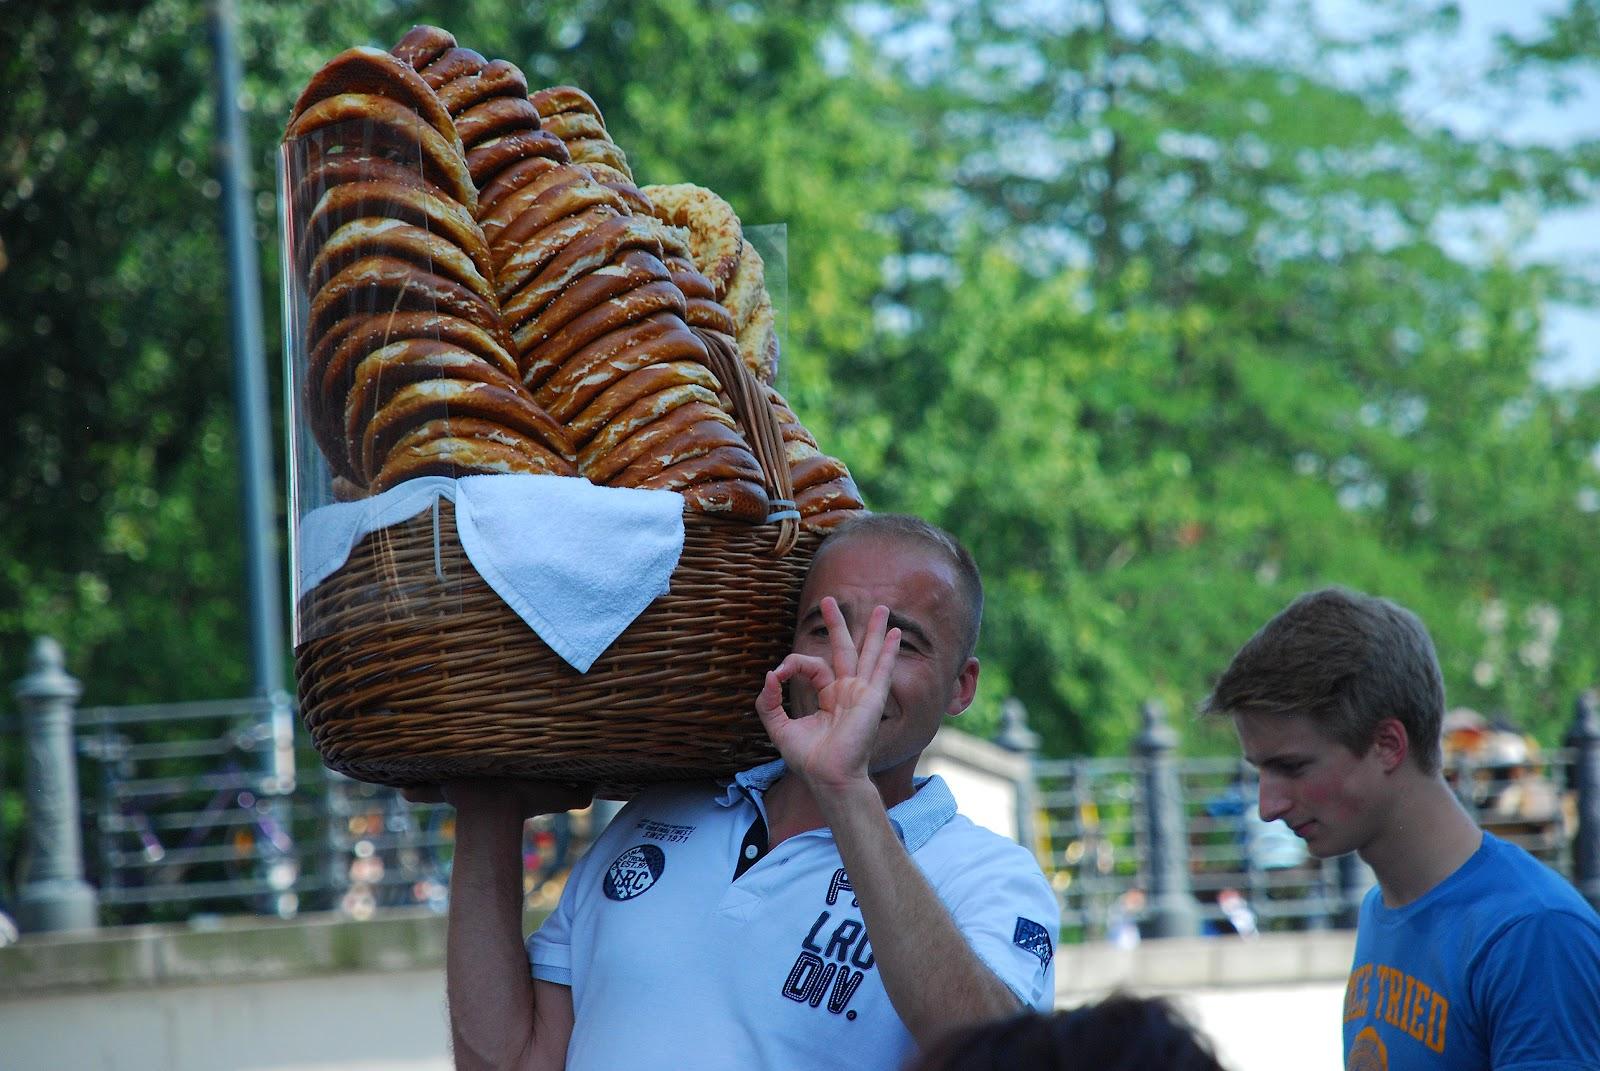 saltkringler fra berlin